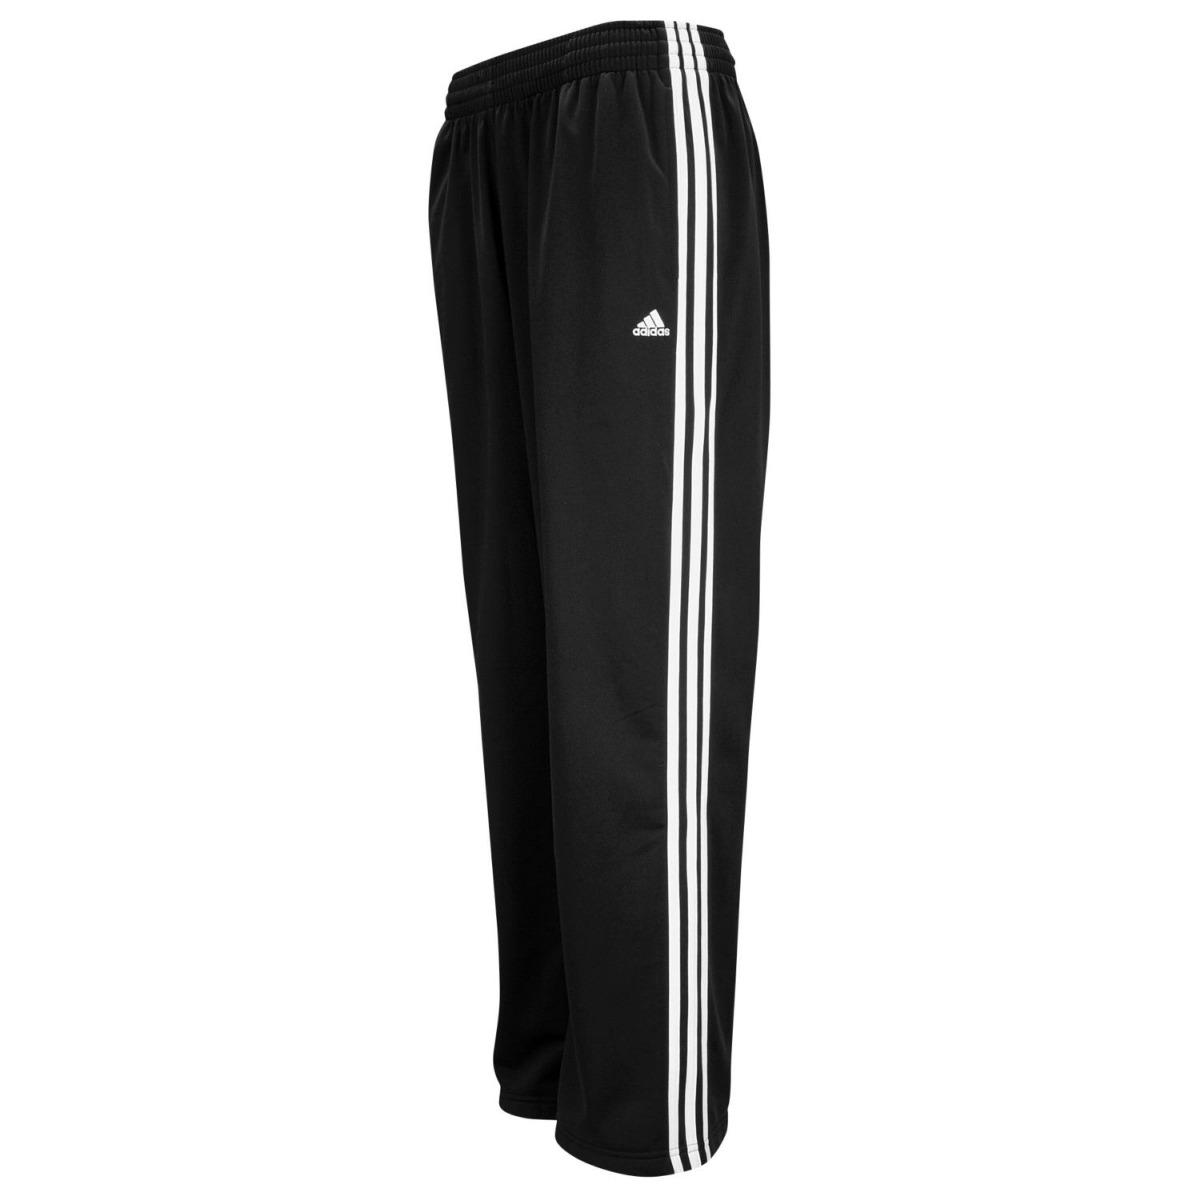 Pantalón Pants adidas Original Para Hombre -   490.00 en Mercado Libre 6f06d75bbb12